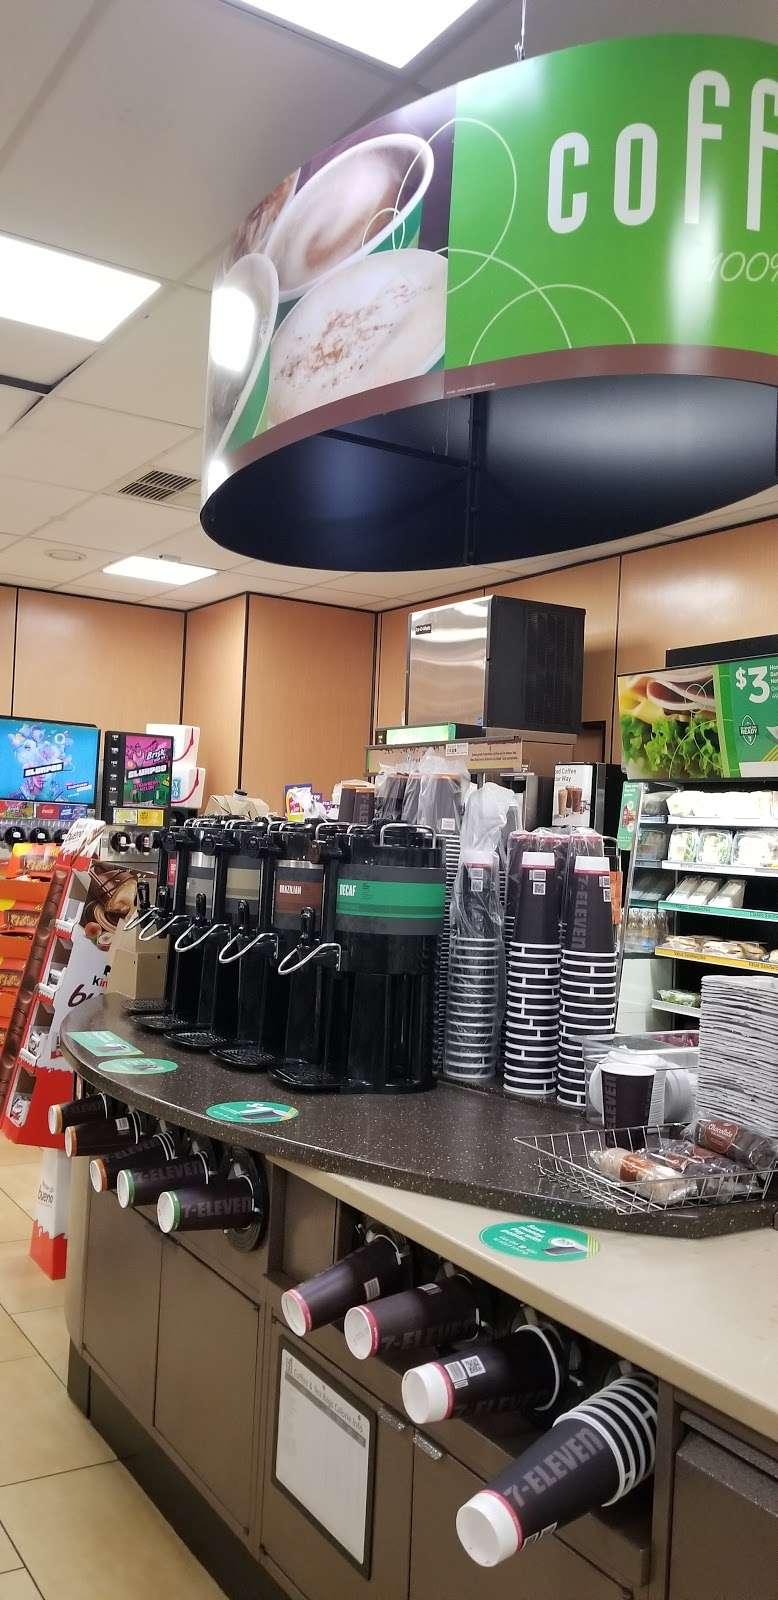 7-Eleven - convenience store  | Photo 2 of 10 | Address: 1189 Route 9 North, Old Bridge Township, NJ 08857, USA | Phone: (732) 727-0407